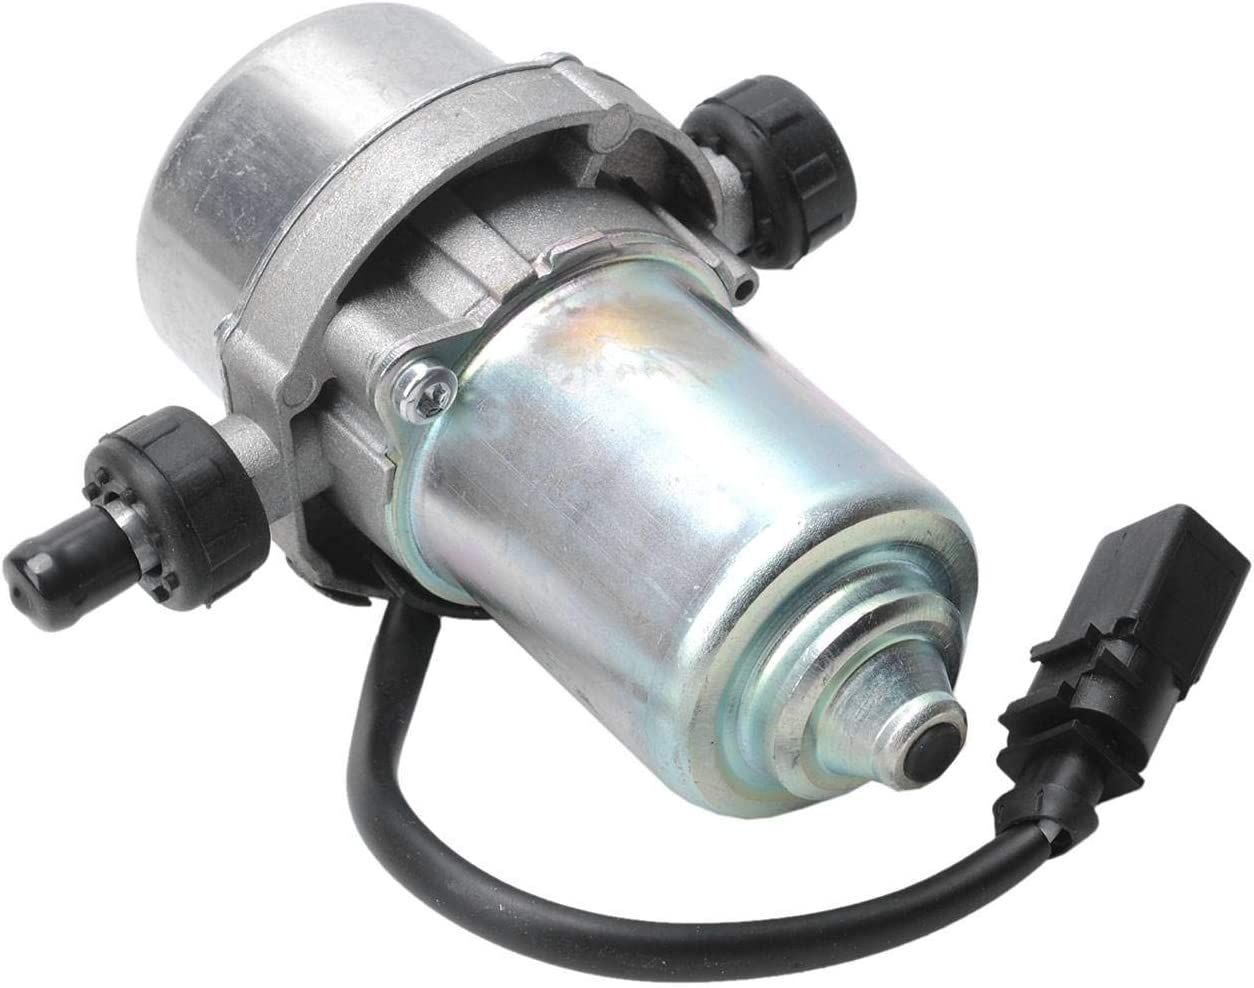 For Audi Q7 S6 R8 A4 A6 Volkswagen Passat 8E0927317H Brake Vacuum Pump